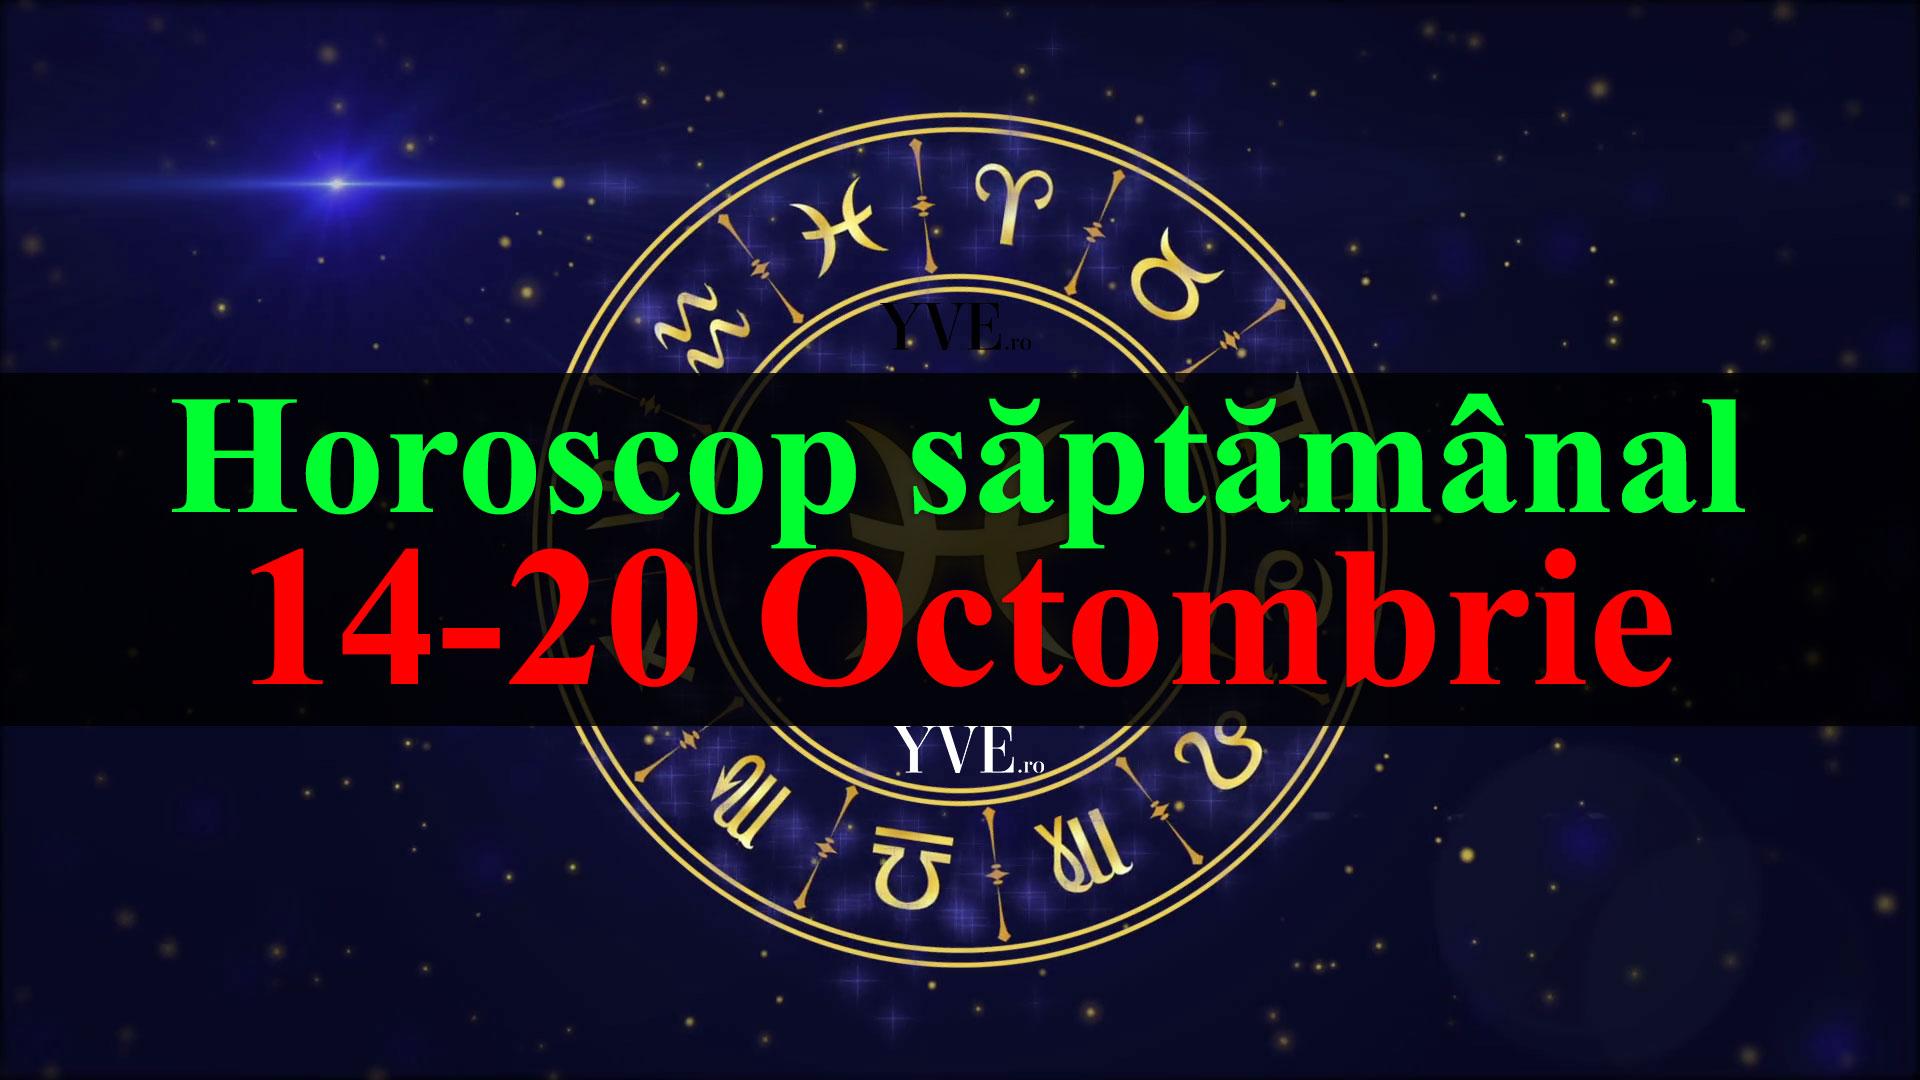 Horoscop saptamanal 14-20 Octombrie 2019